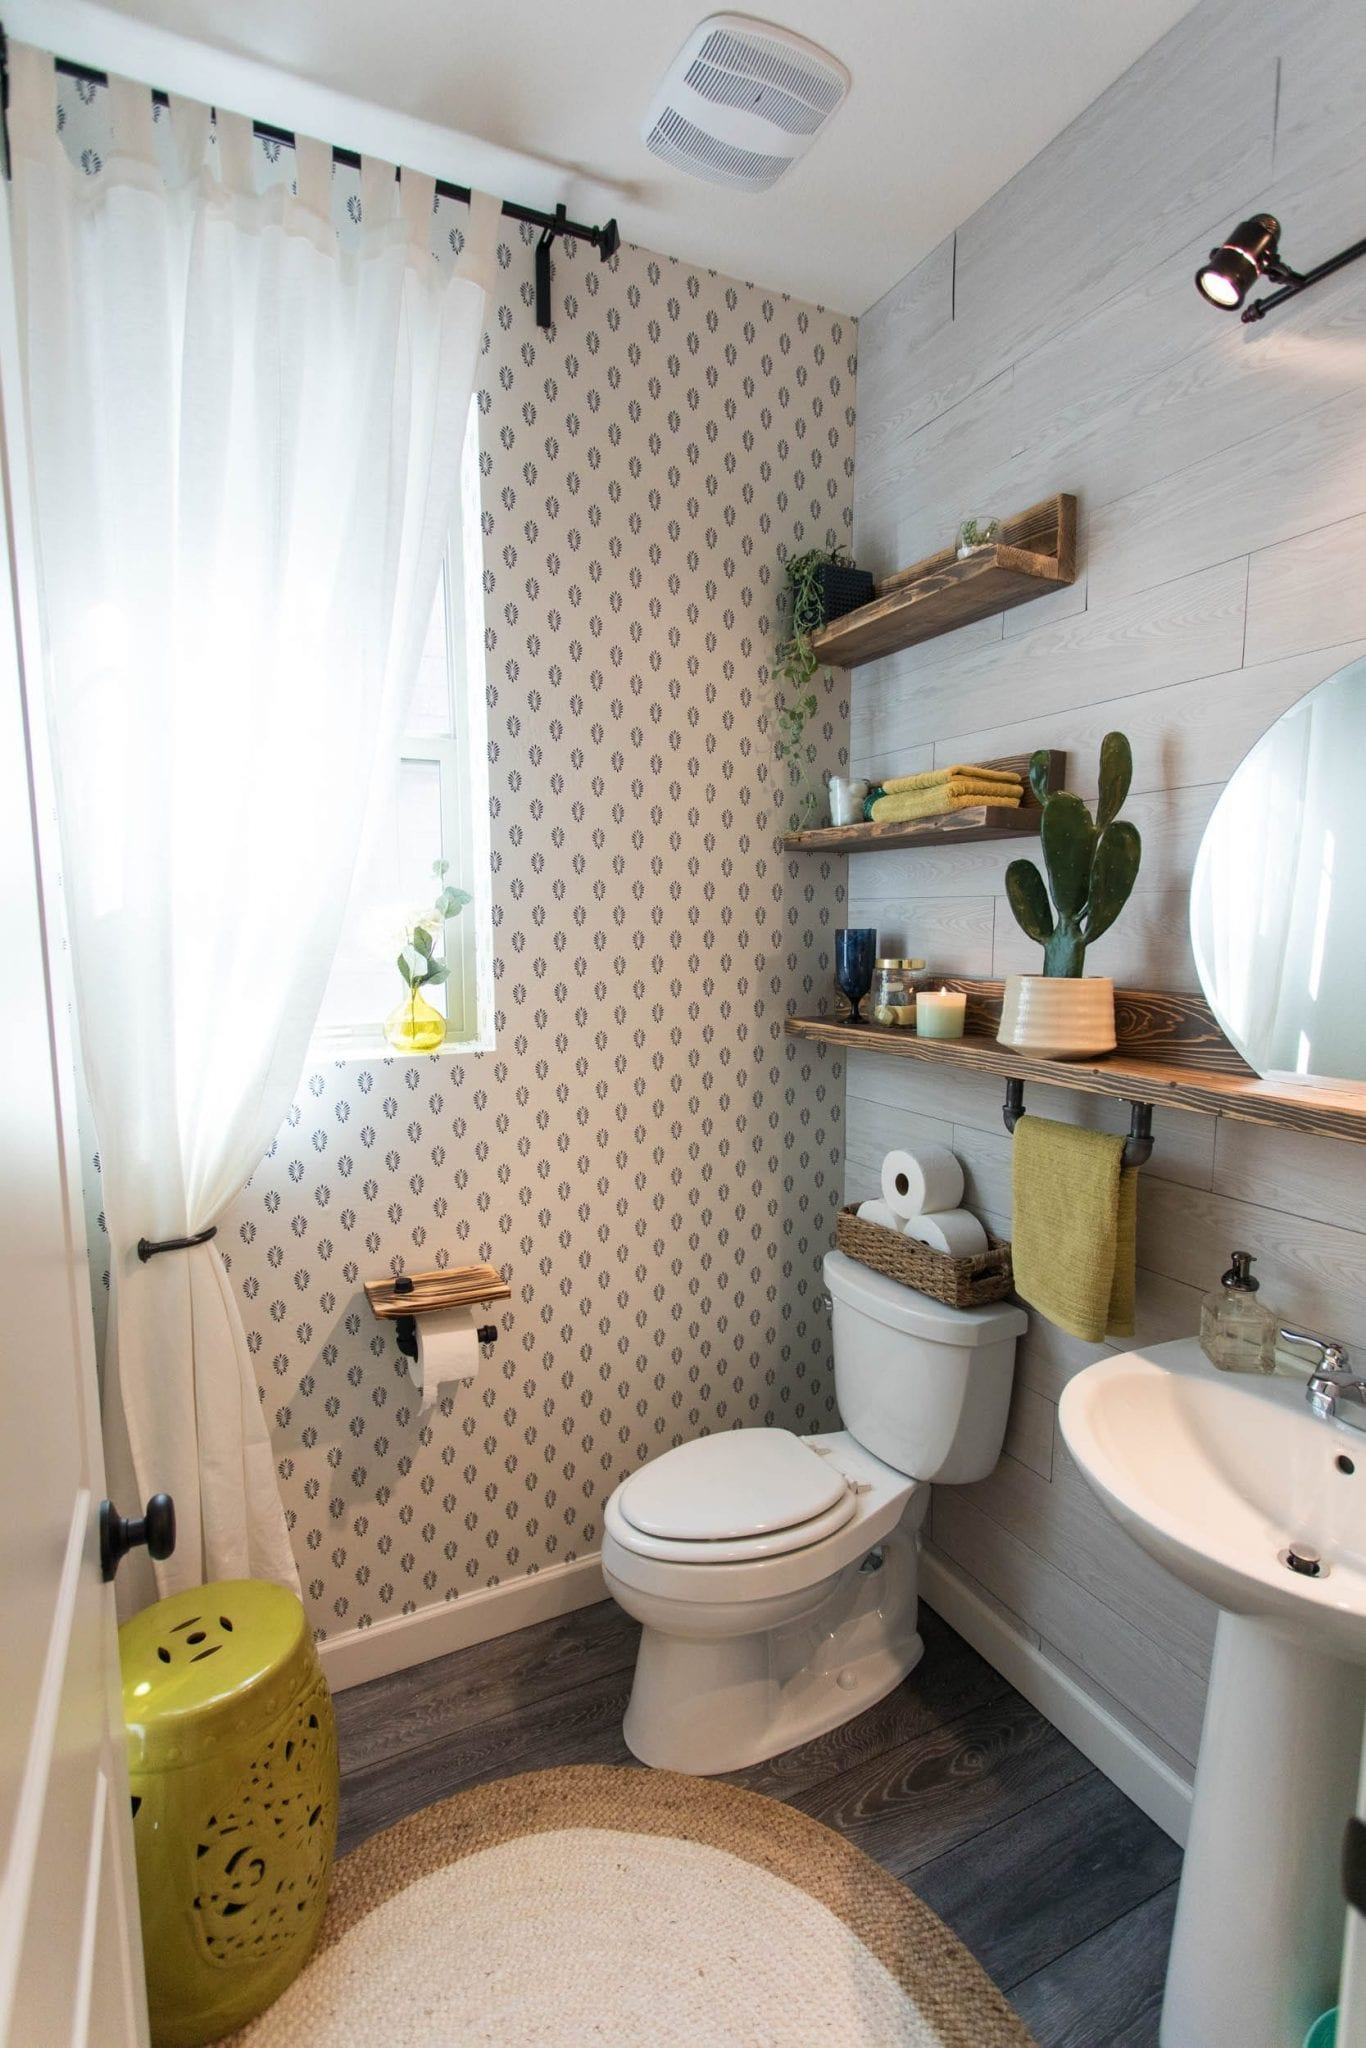 This Powder bath makeover gives you small powder bathroom ideas for transforming your space with elegant industrial powder bath decor | Never Skip Brunch by Cara Newhart #design #decor #interiordesign